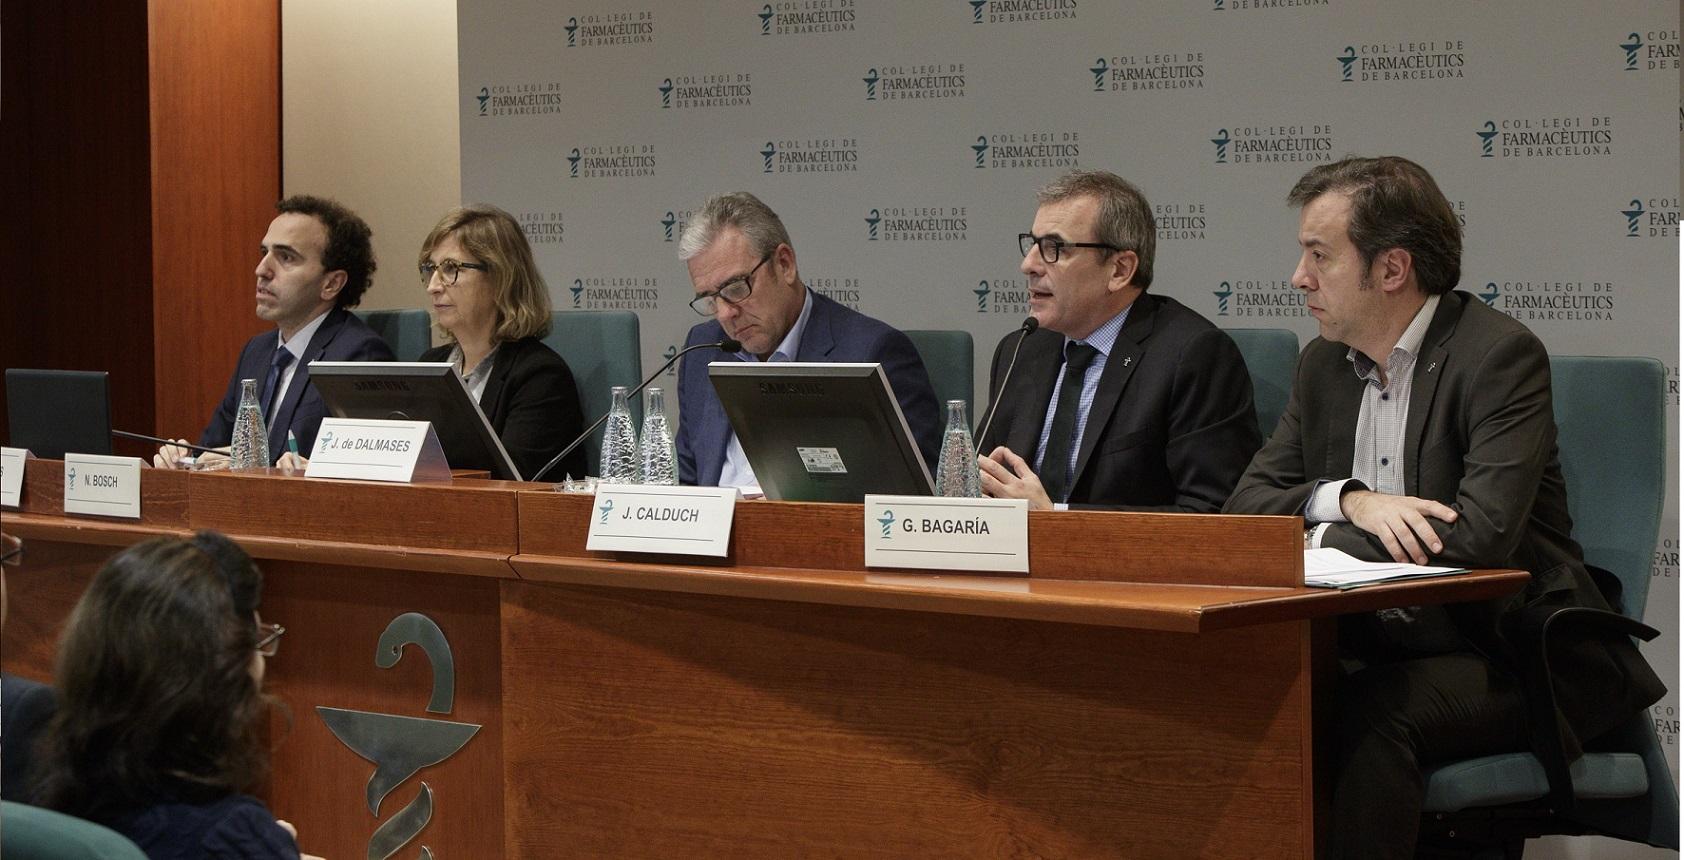 D'esquerra a dreta: Jordi Casas, secretari; Núria Bosch, vicepresidenta; Jordi de Dalmases, president; Joan Calduch, tresorer, i Guillermo Bagaria, vicetresorer